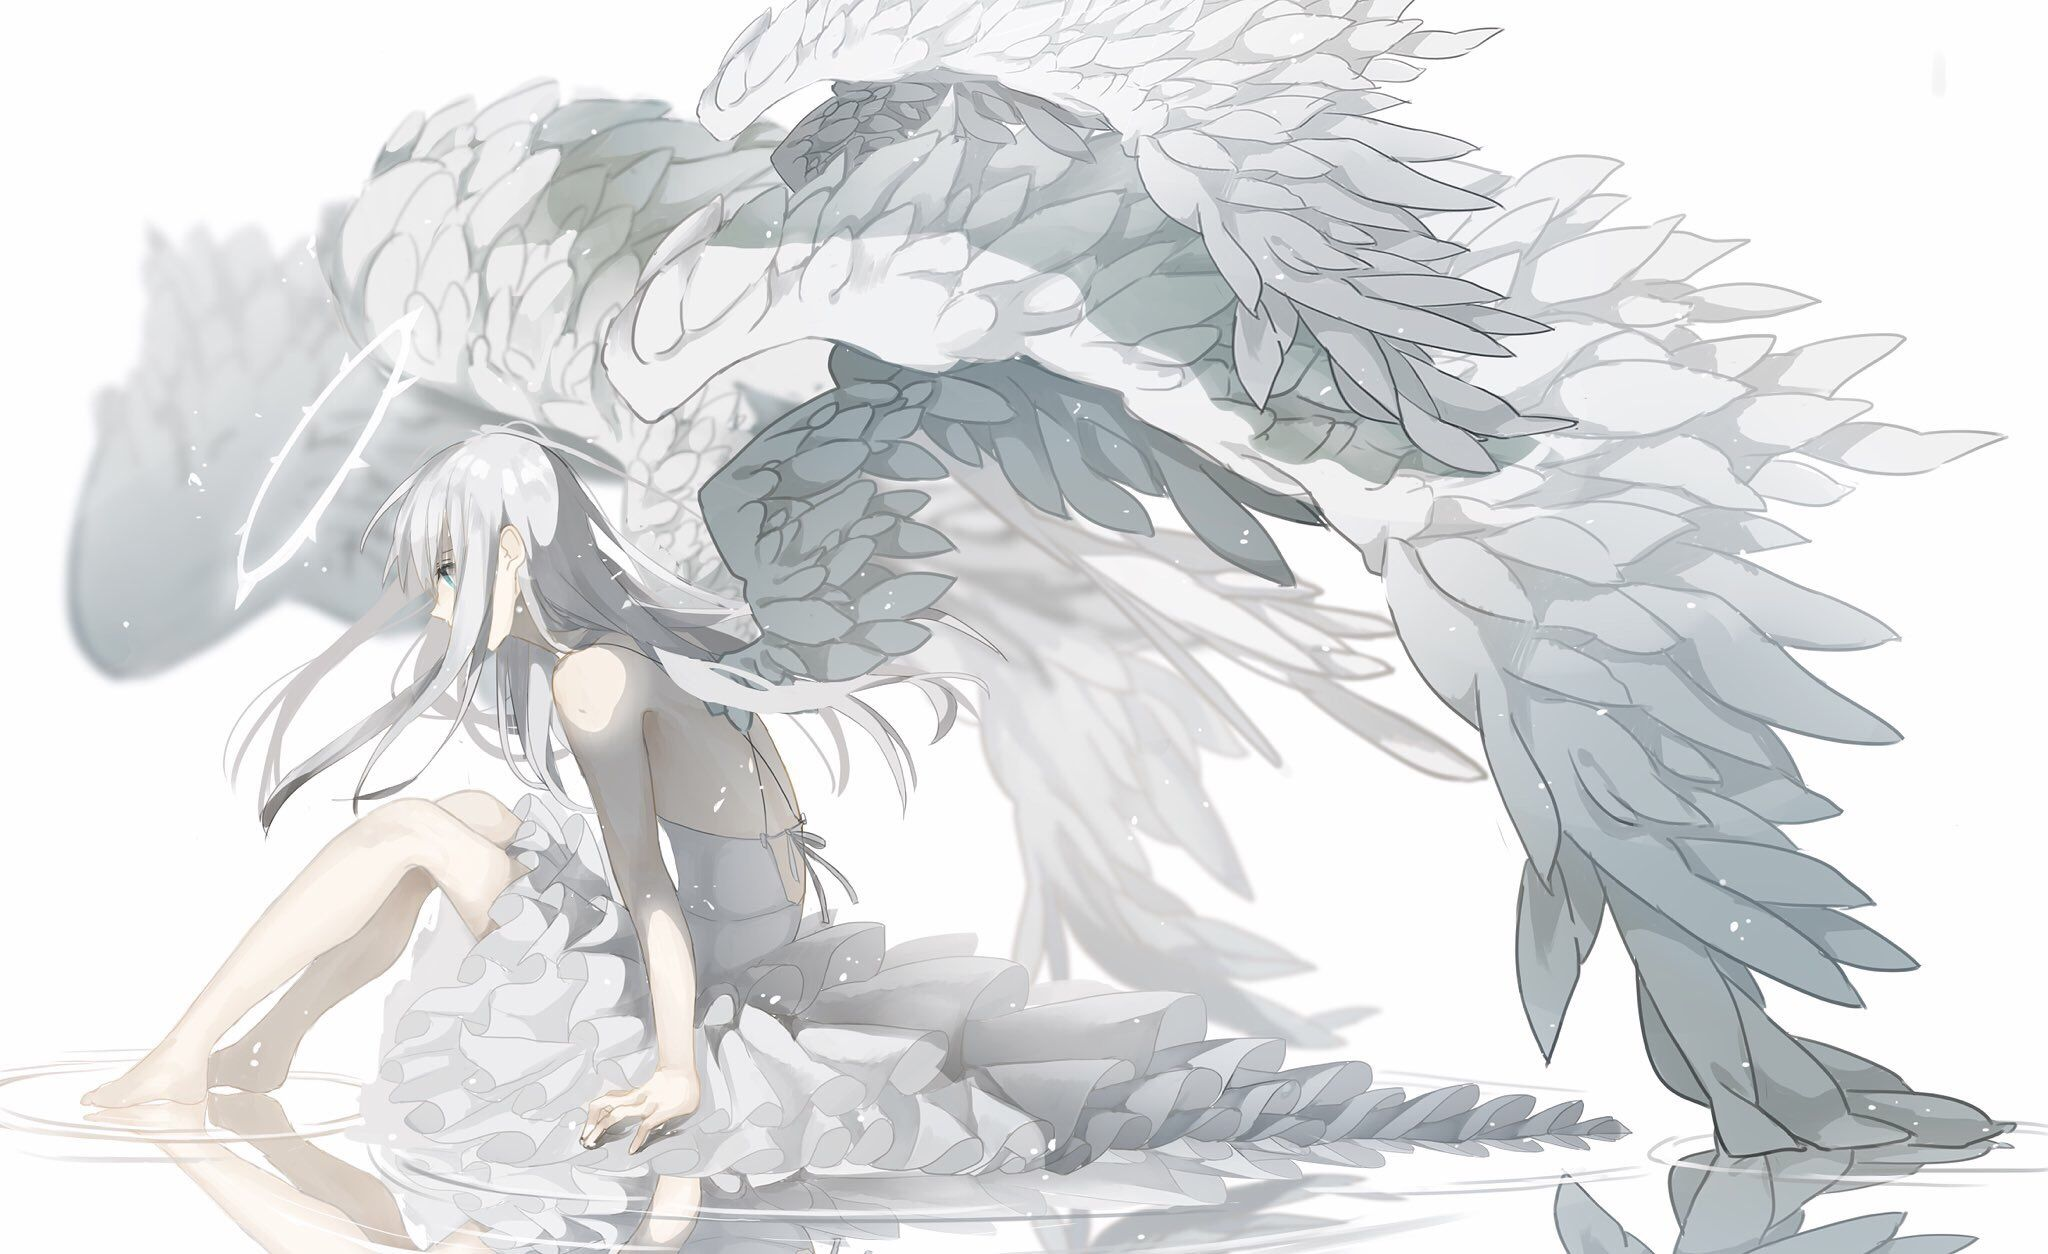 Pinterest  Anime angel girl, Angel manga, Anime angel